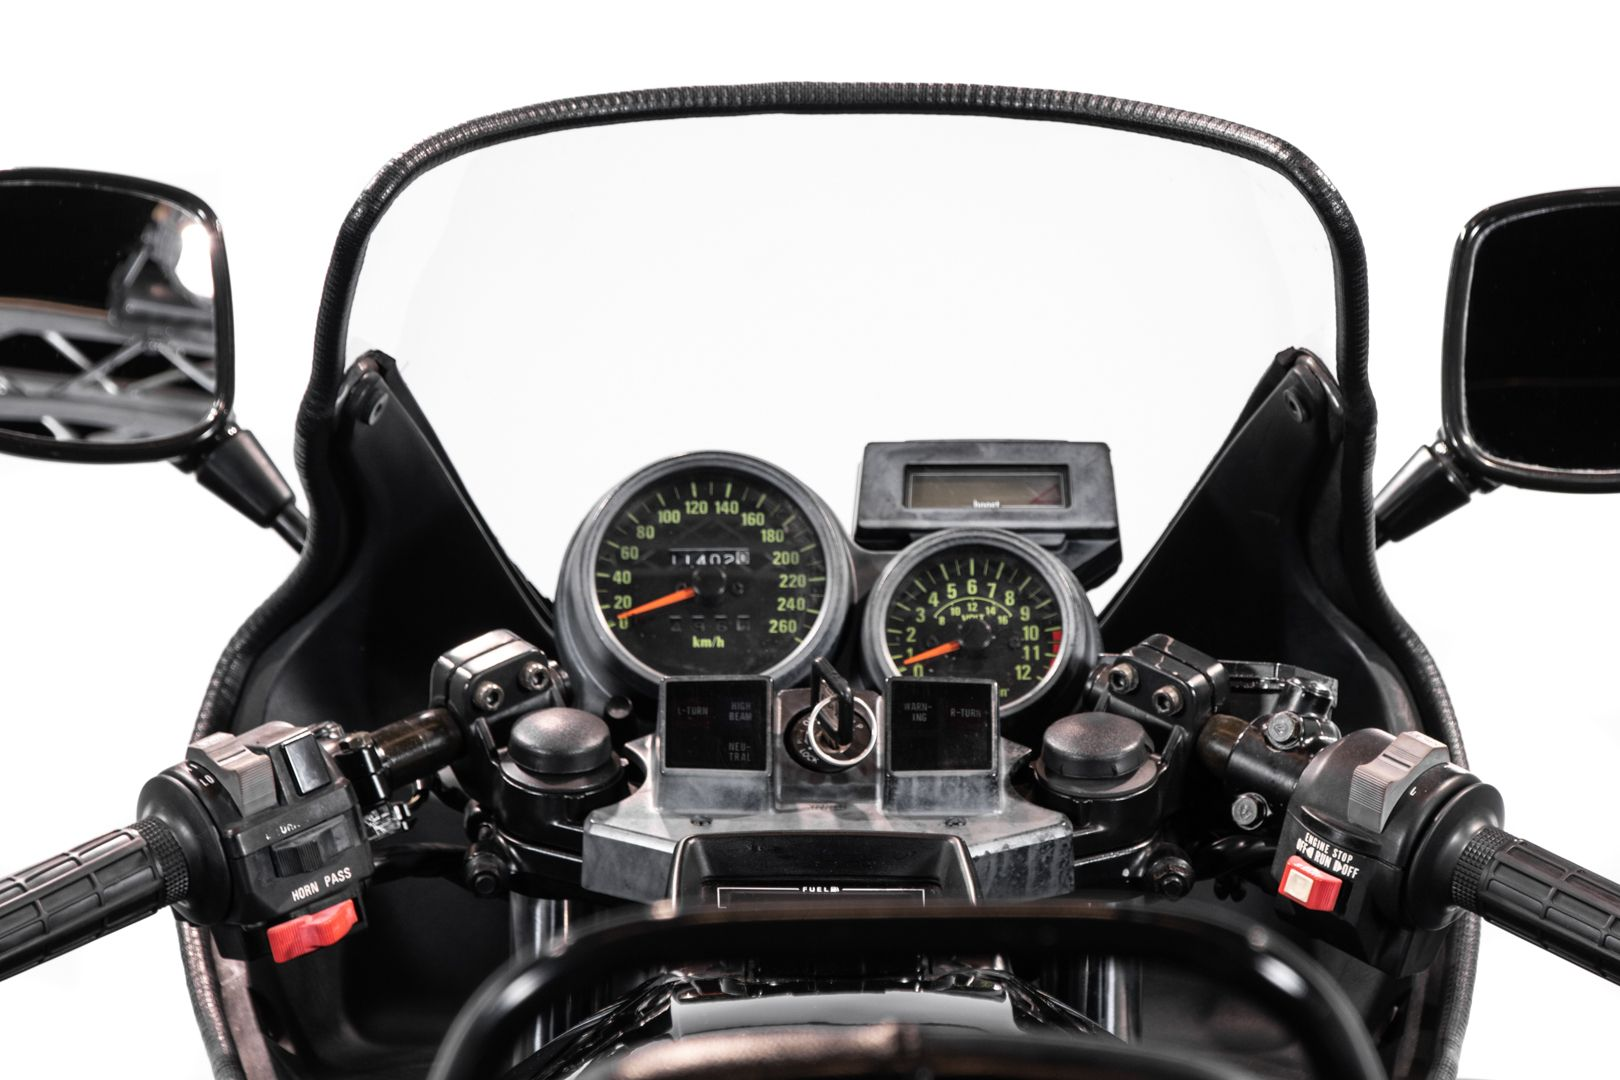 1985 Kawasaki Turbo 750 84971